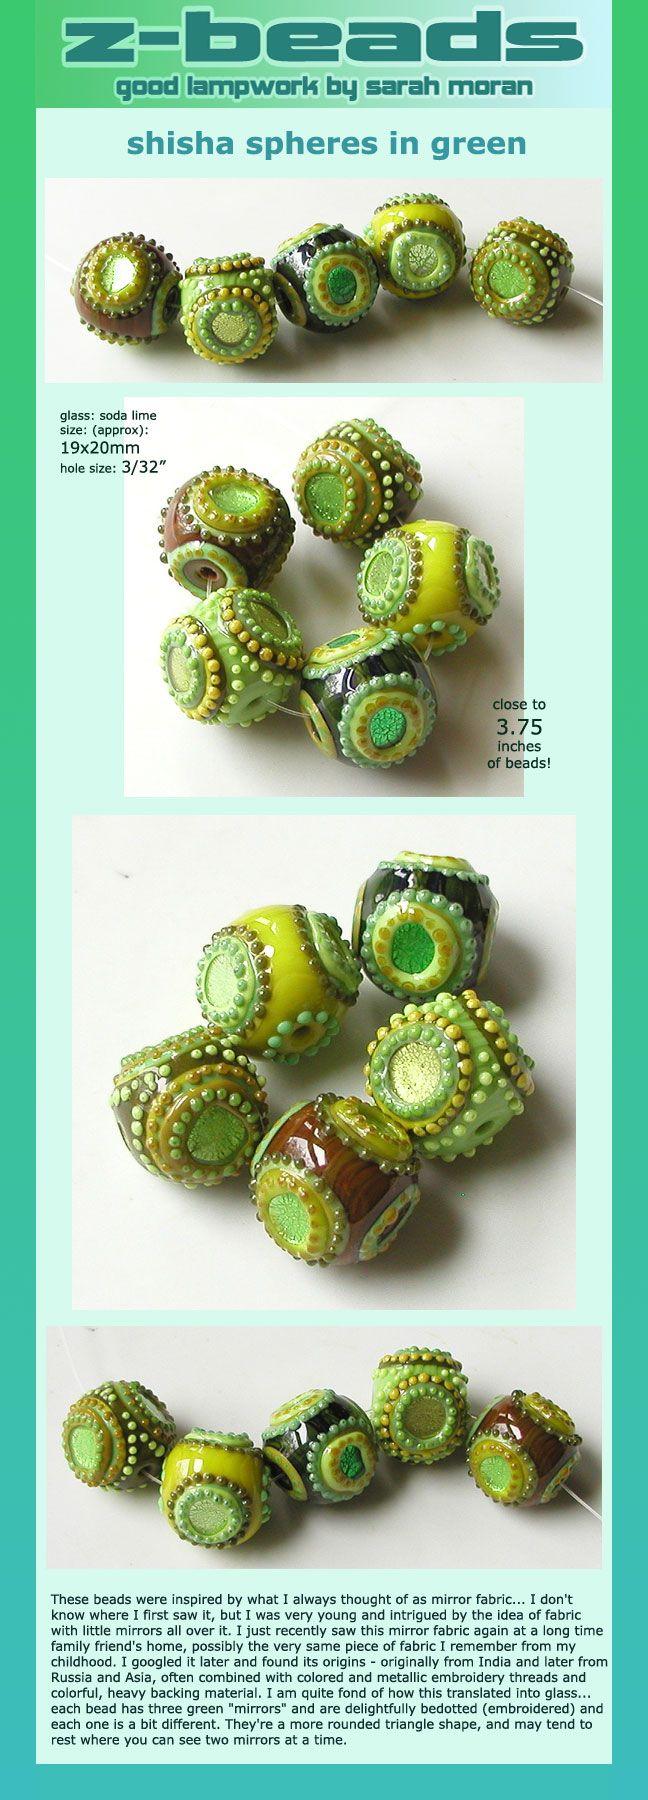 shisha spheres in green by zbeads sarah moran